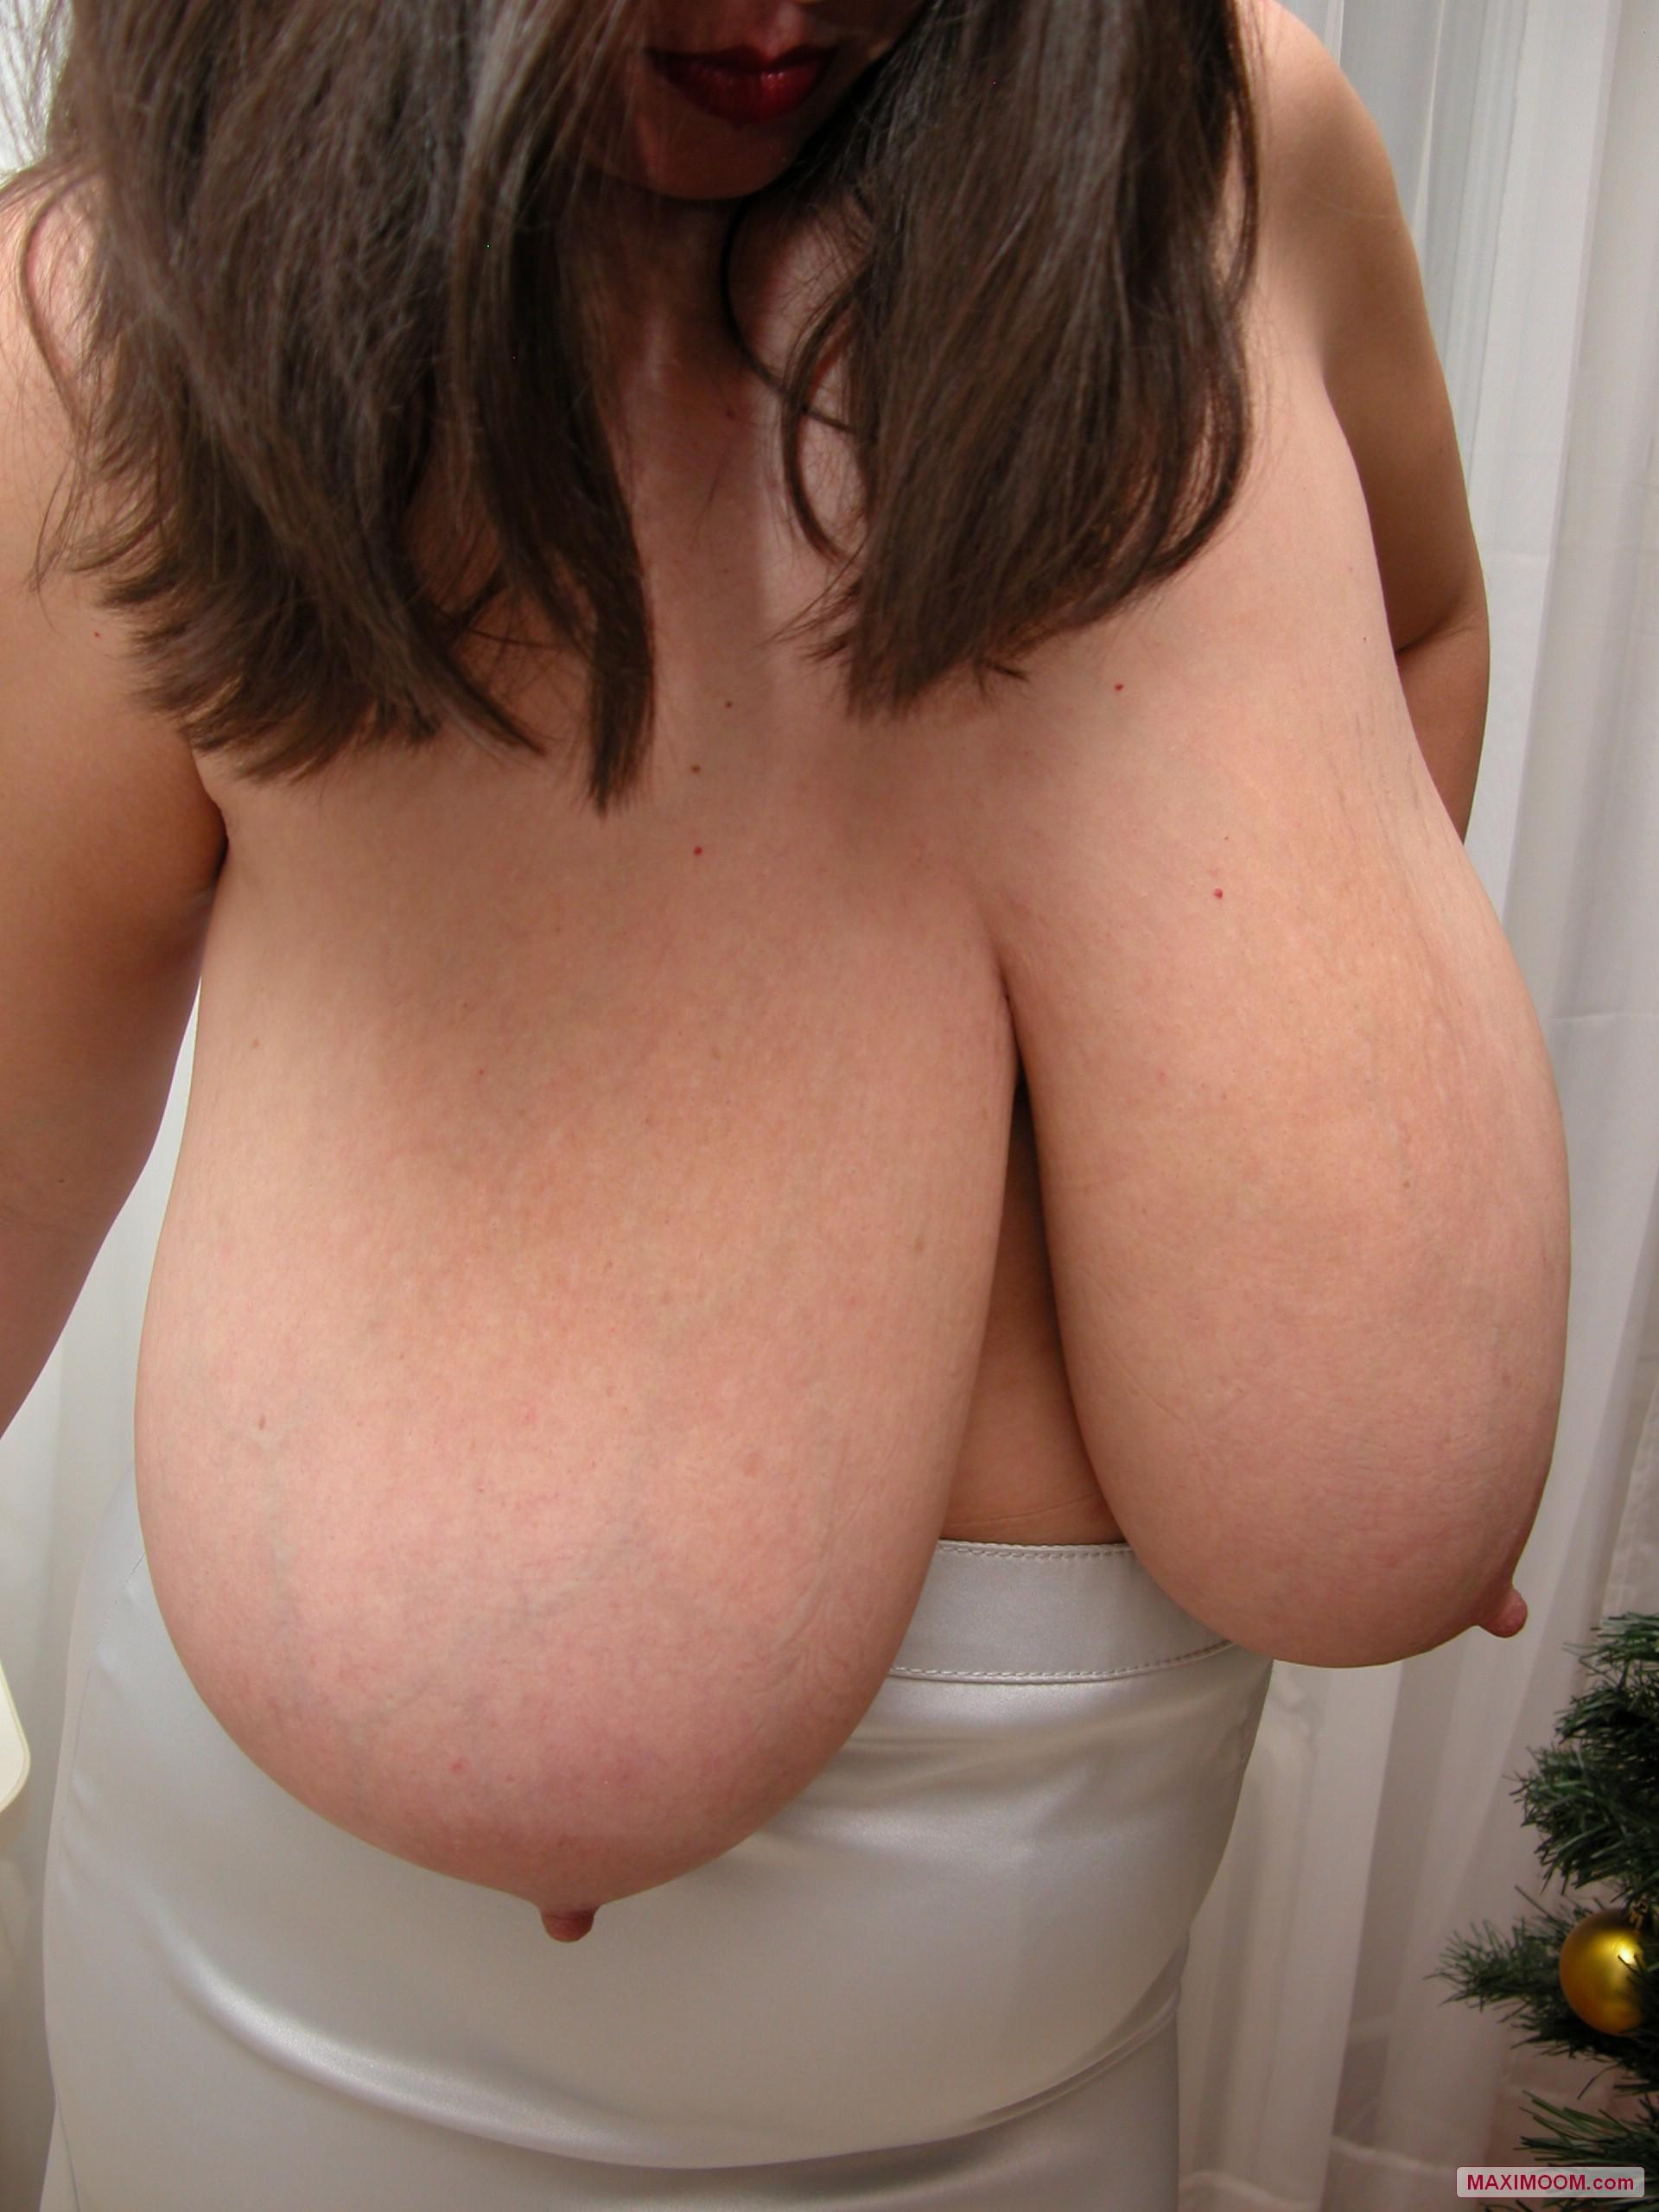 Breasts low hangers gallery boobs